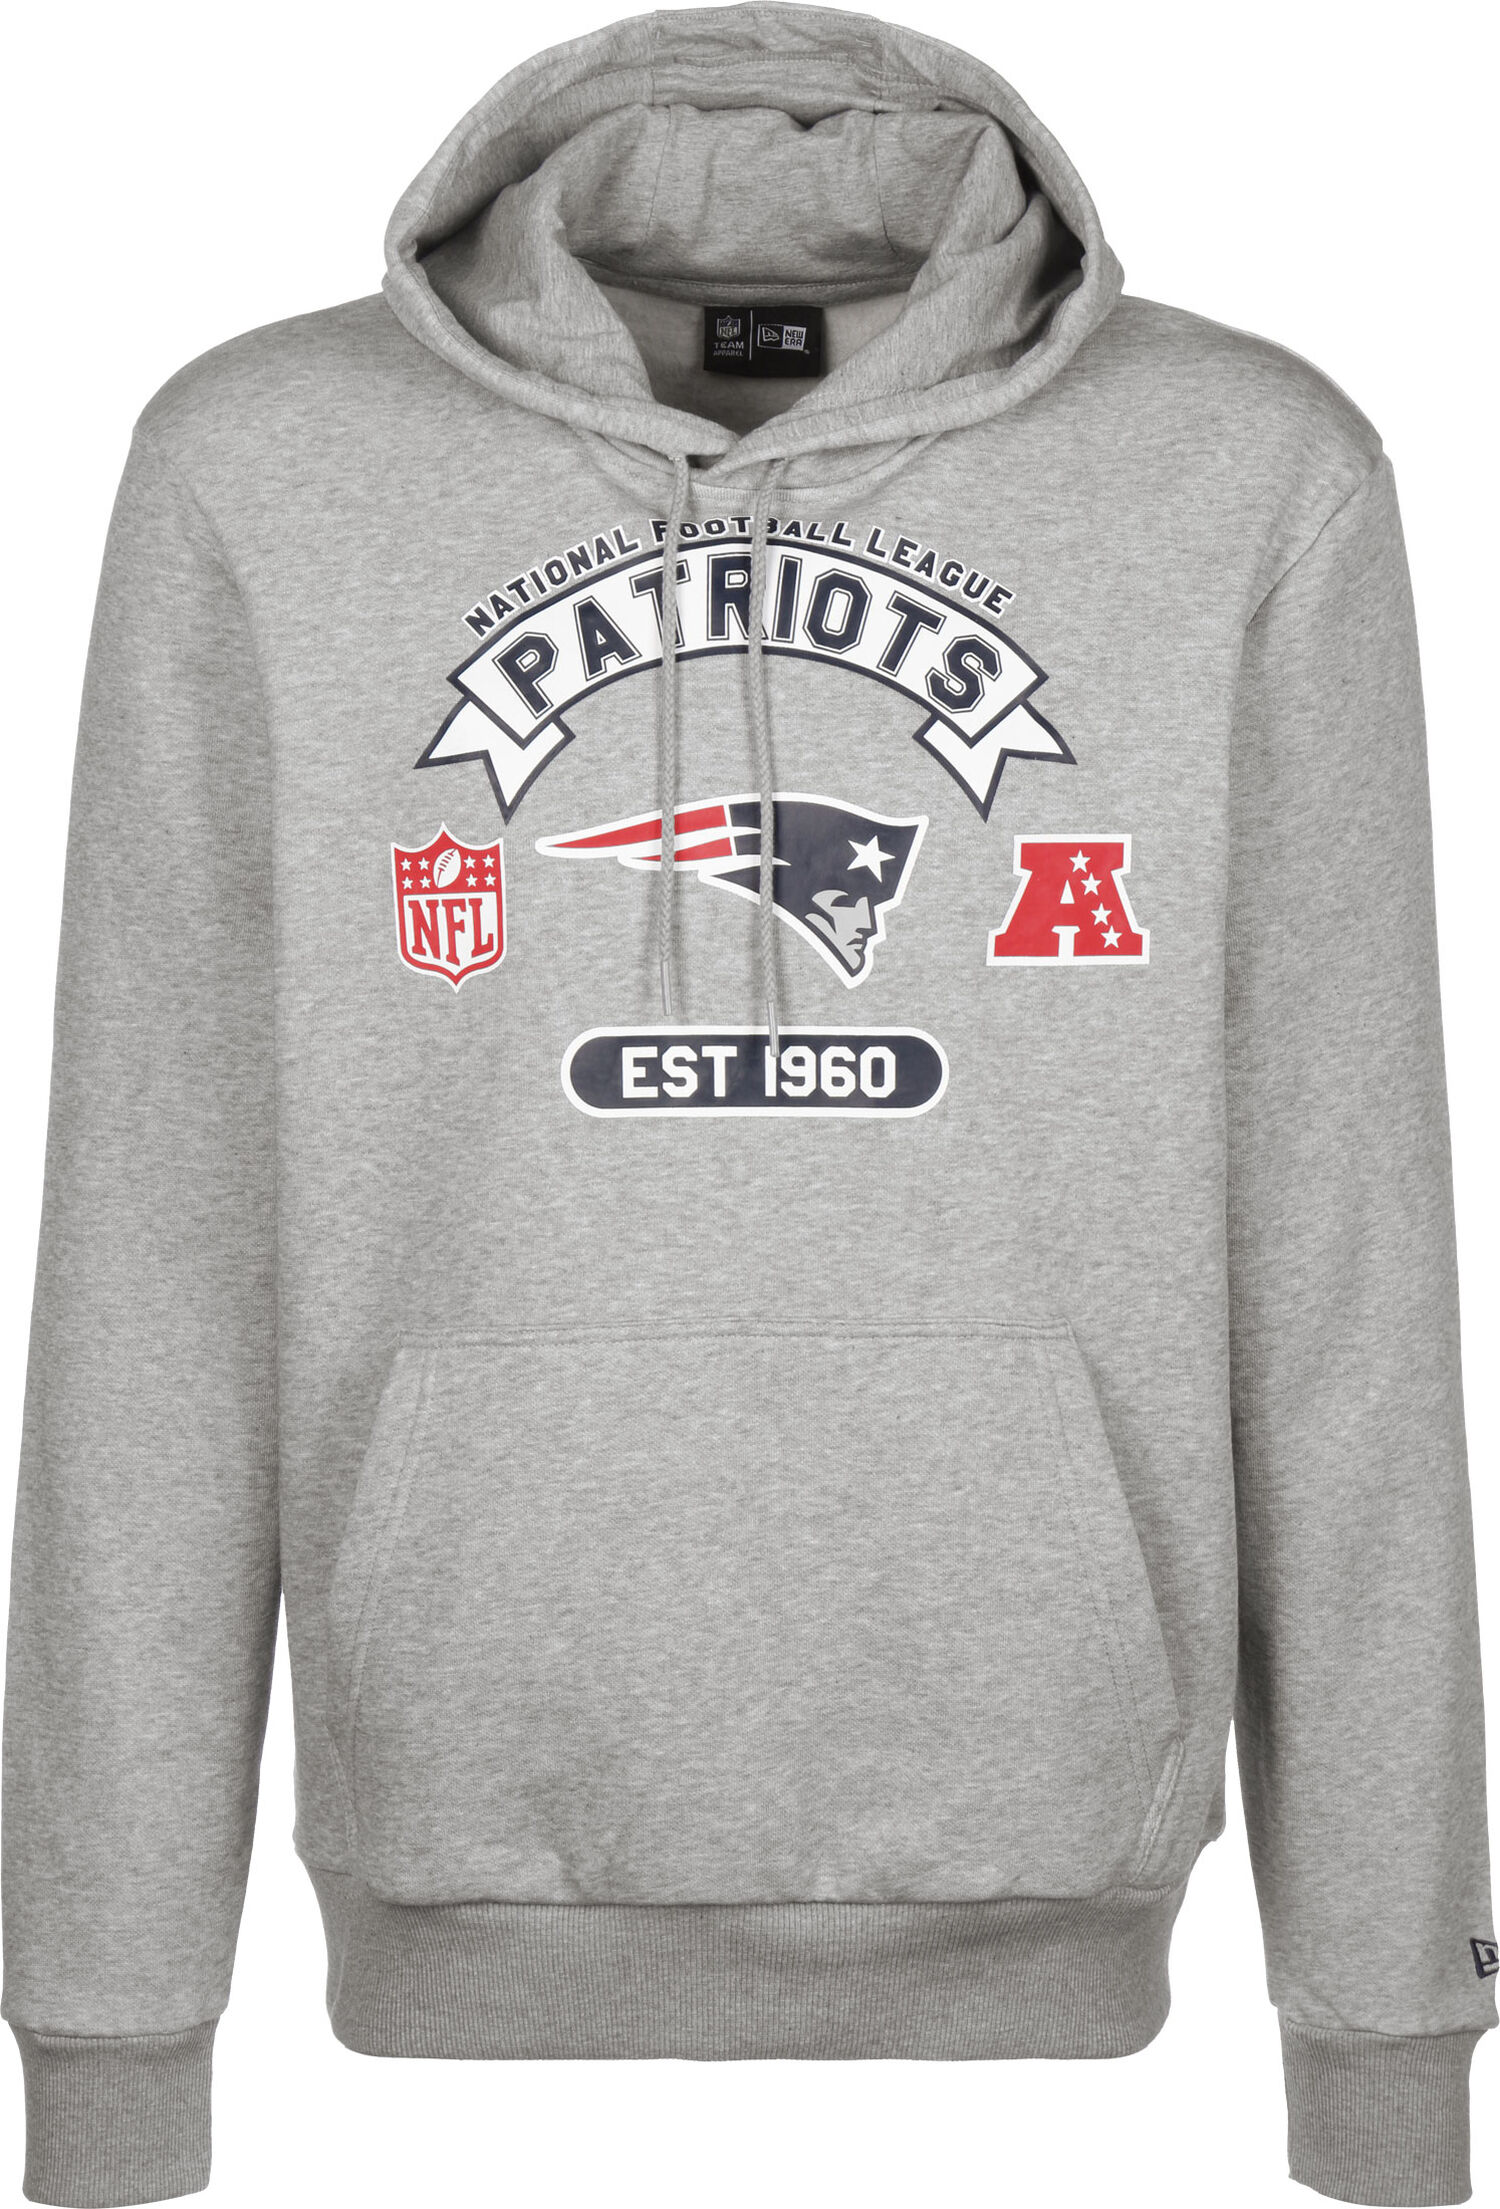 NFL Graphic New England Patriots